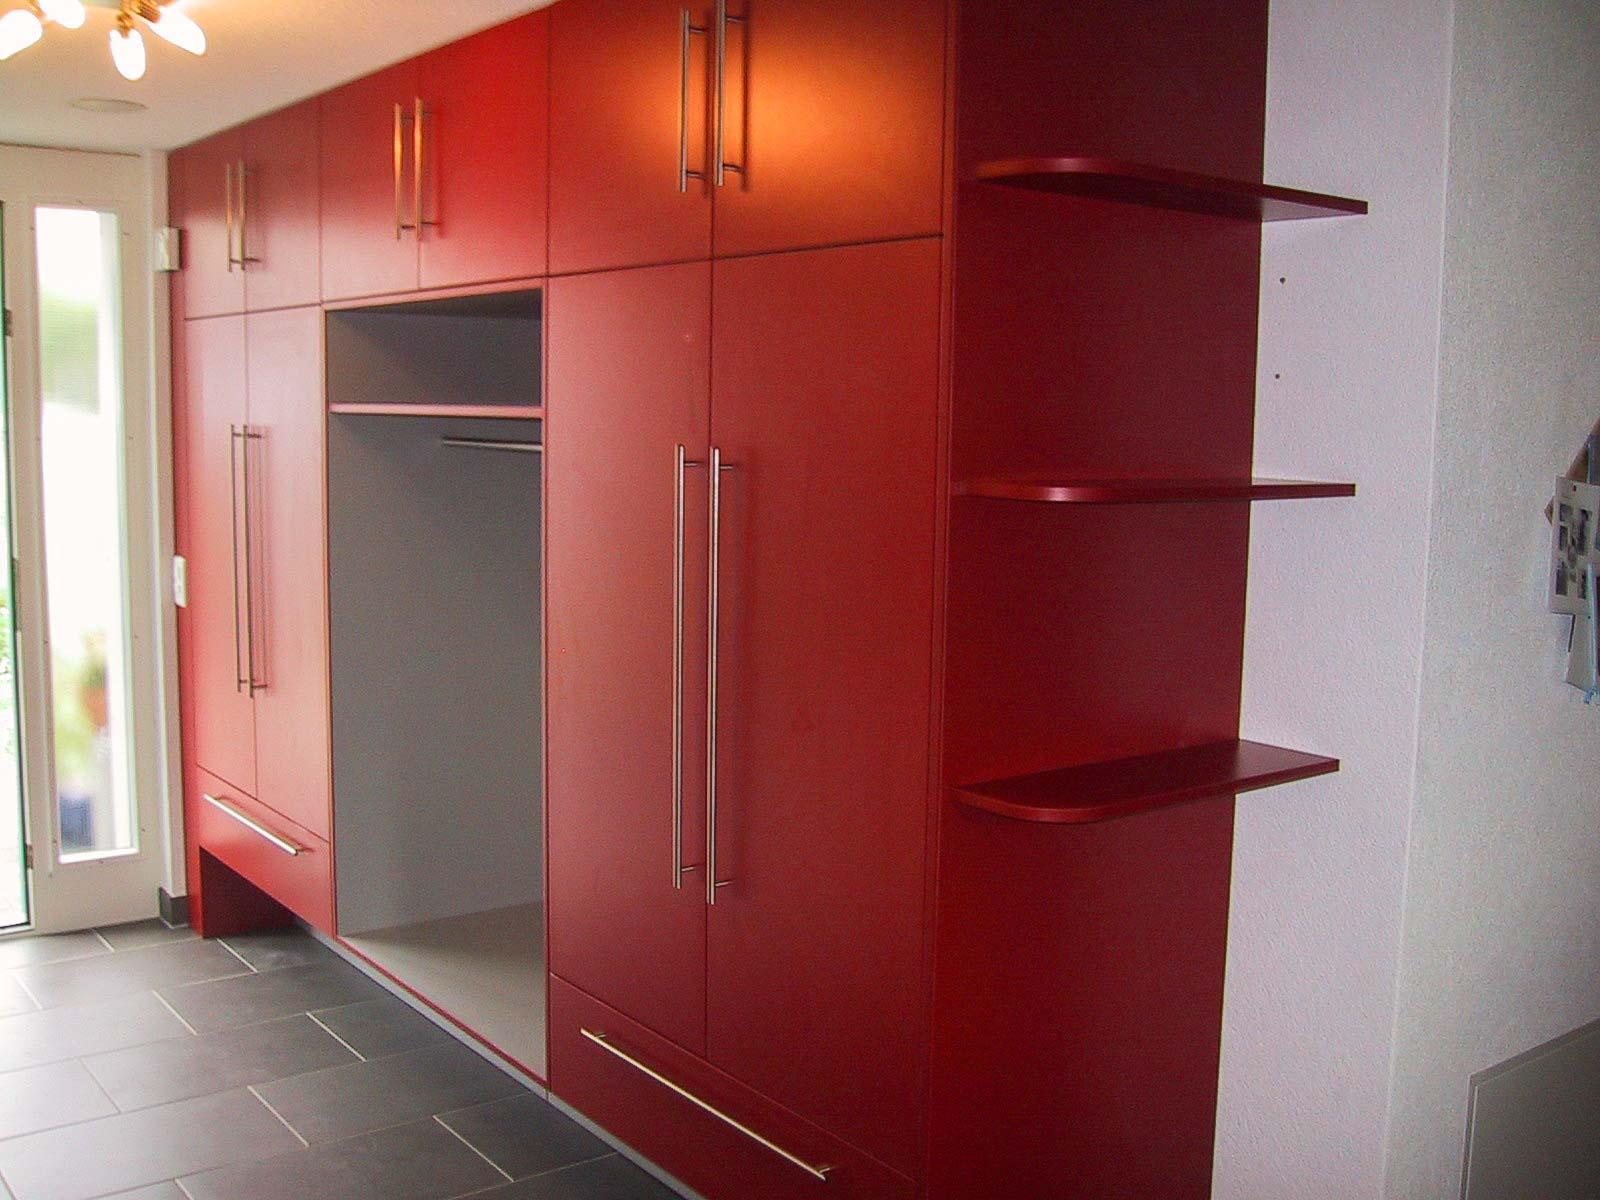 Wooddesign_Garderobe_Gästegarderobe_rot_grau